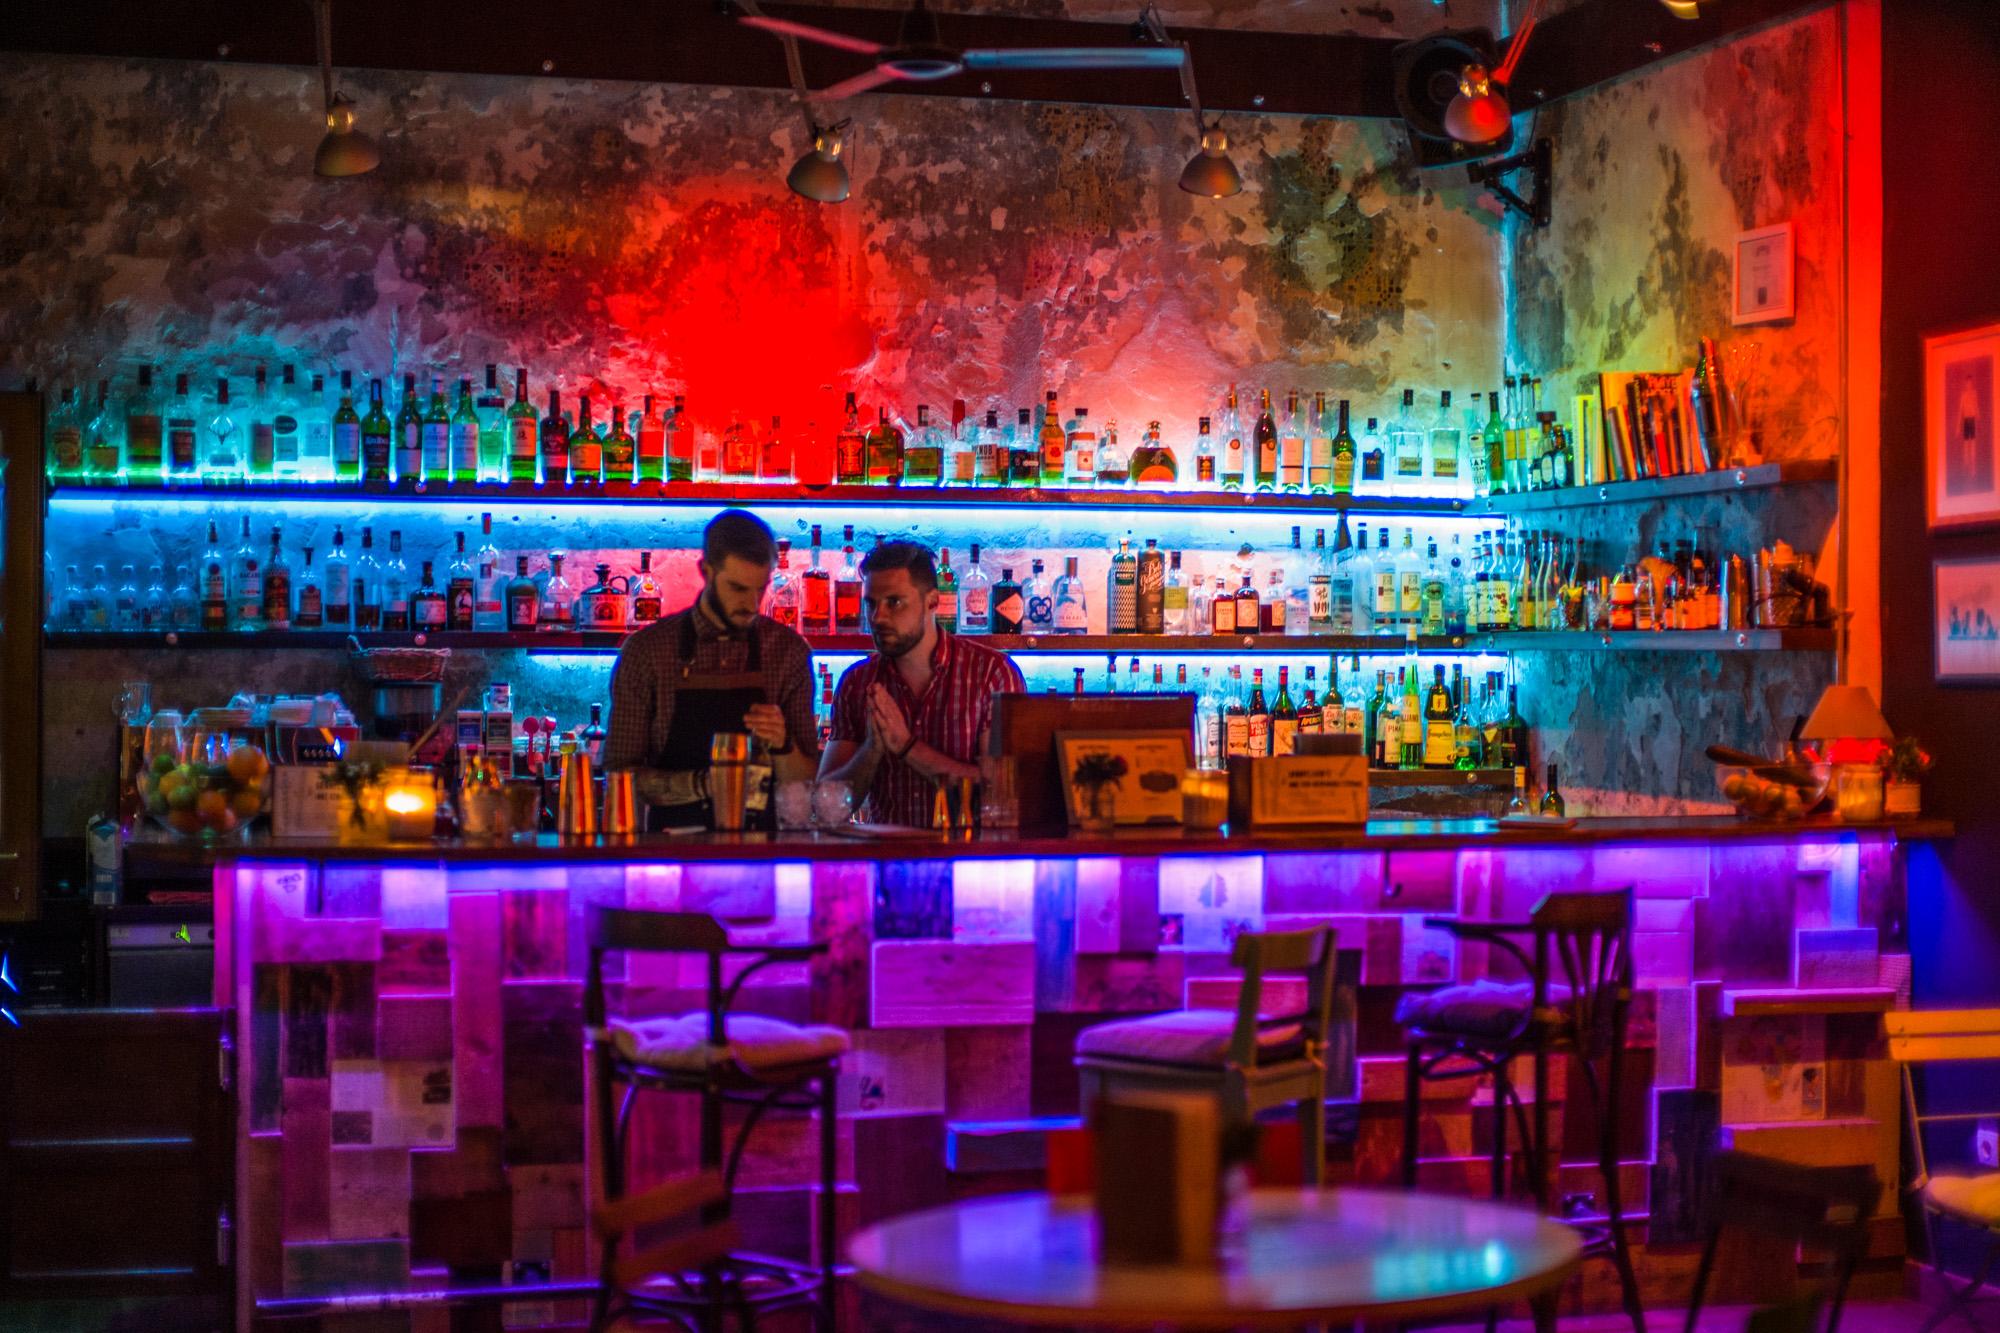 Ruin Bar at Brody Studio in Budapest